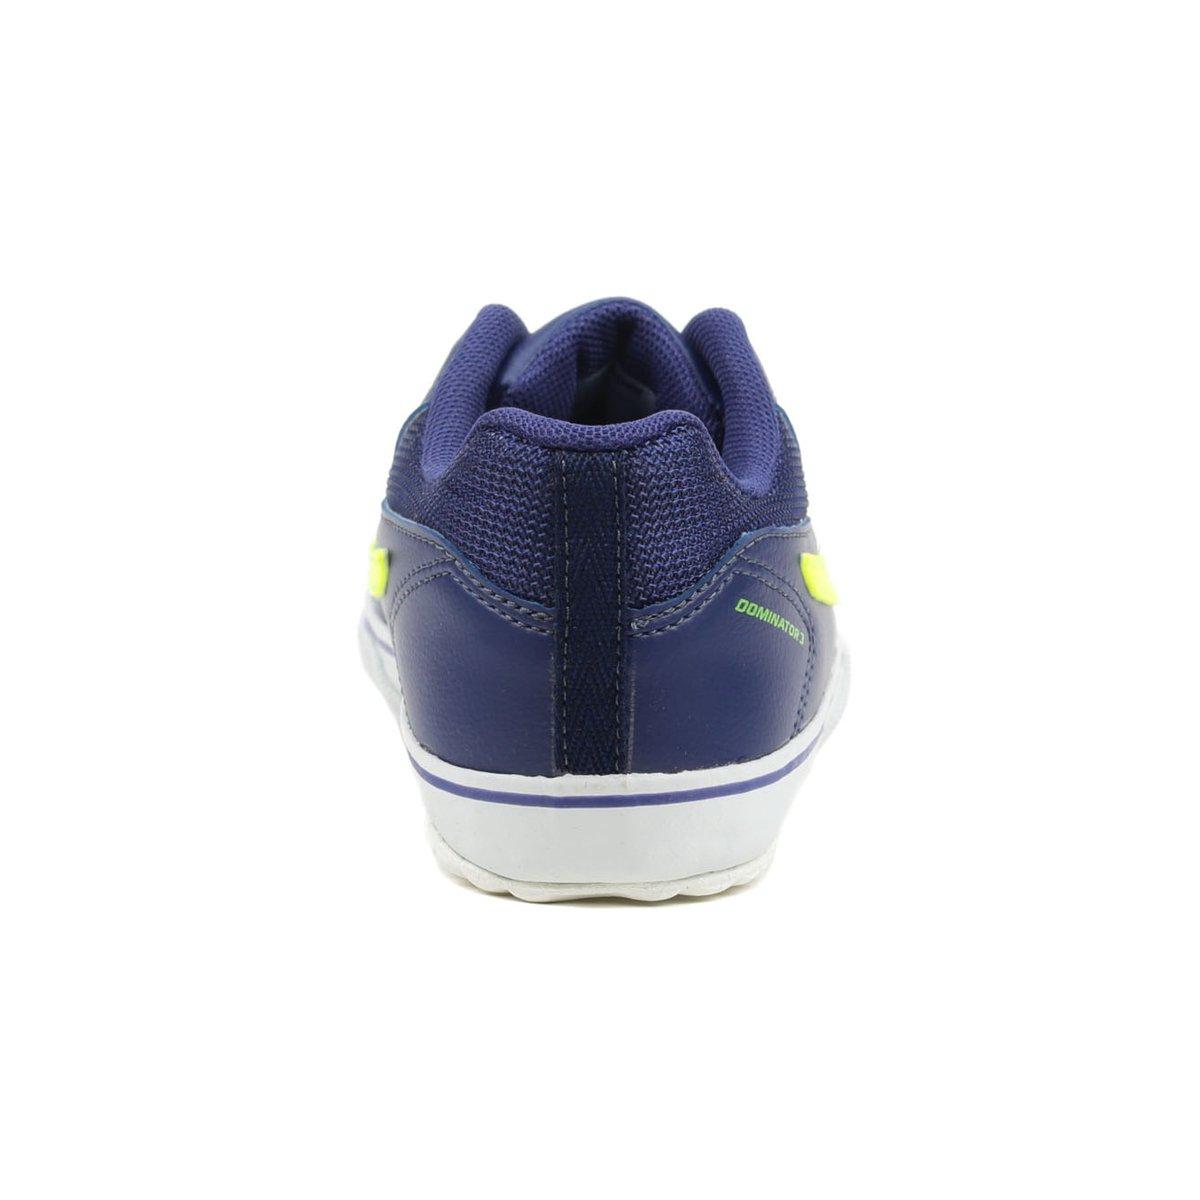 d047880e20 ... Tênis Futsal Infantil Para Menino Topper Dominator Iii Jr Azul marinho verde  ...